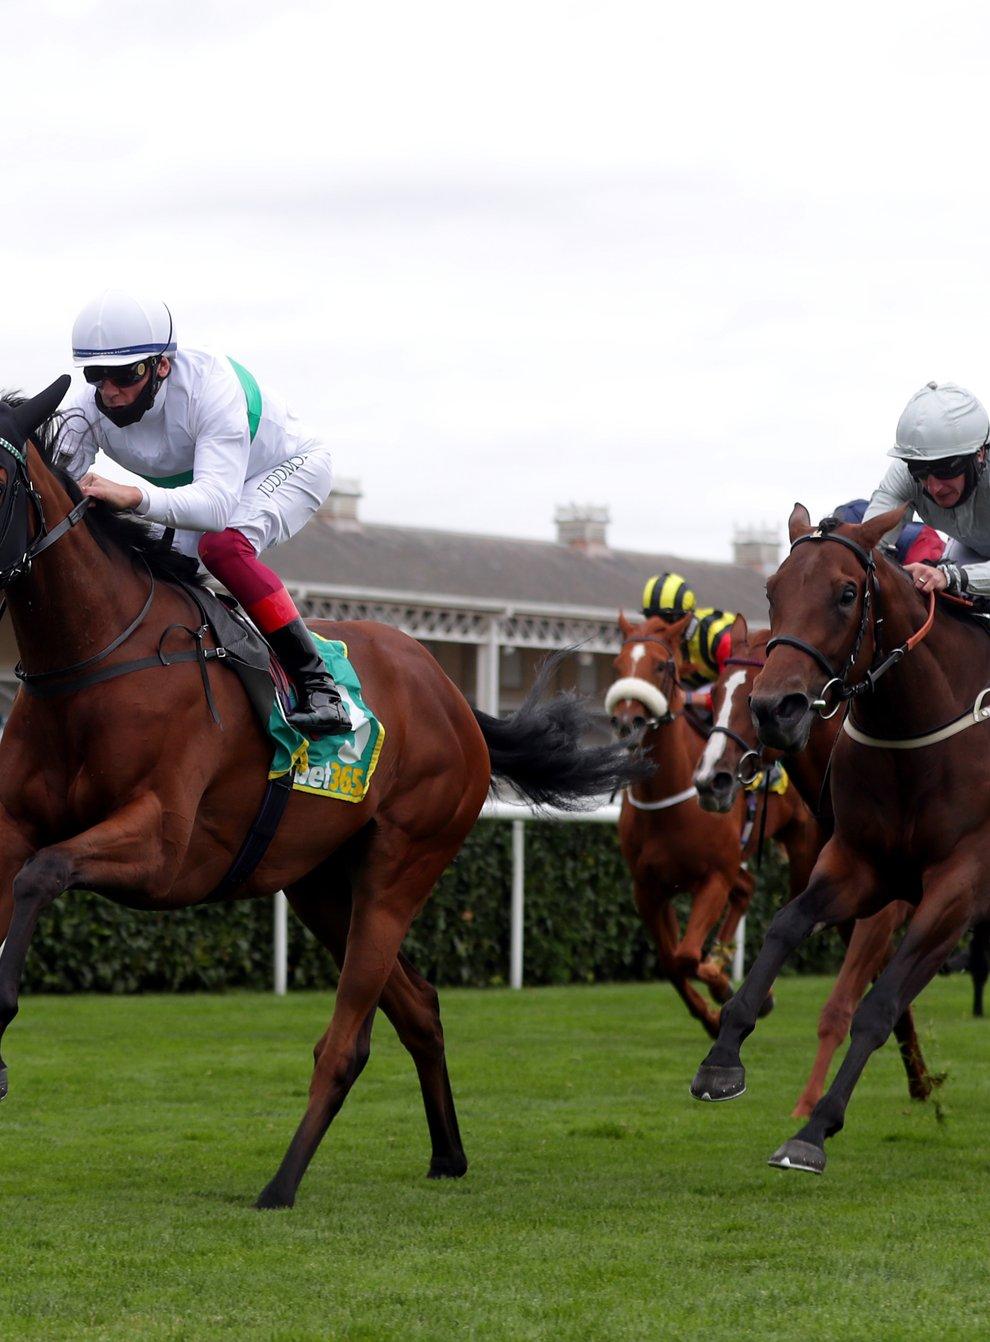 Indigo Girl (left) winning the May Hill Stakes at Doncaster (David Davies/PA)